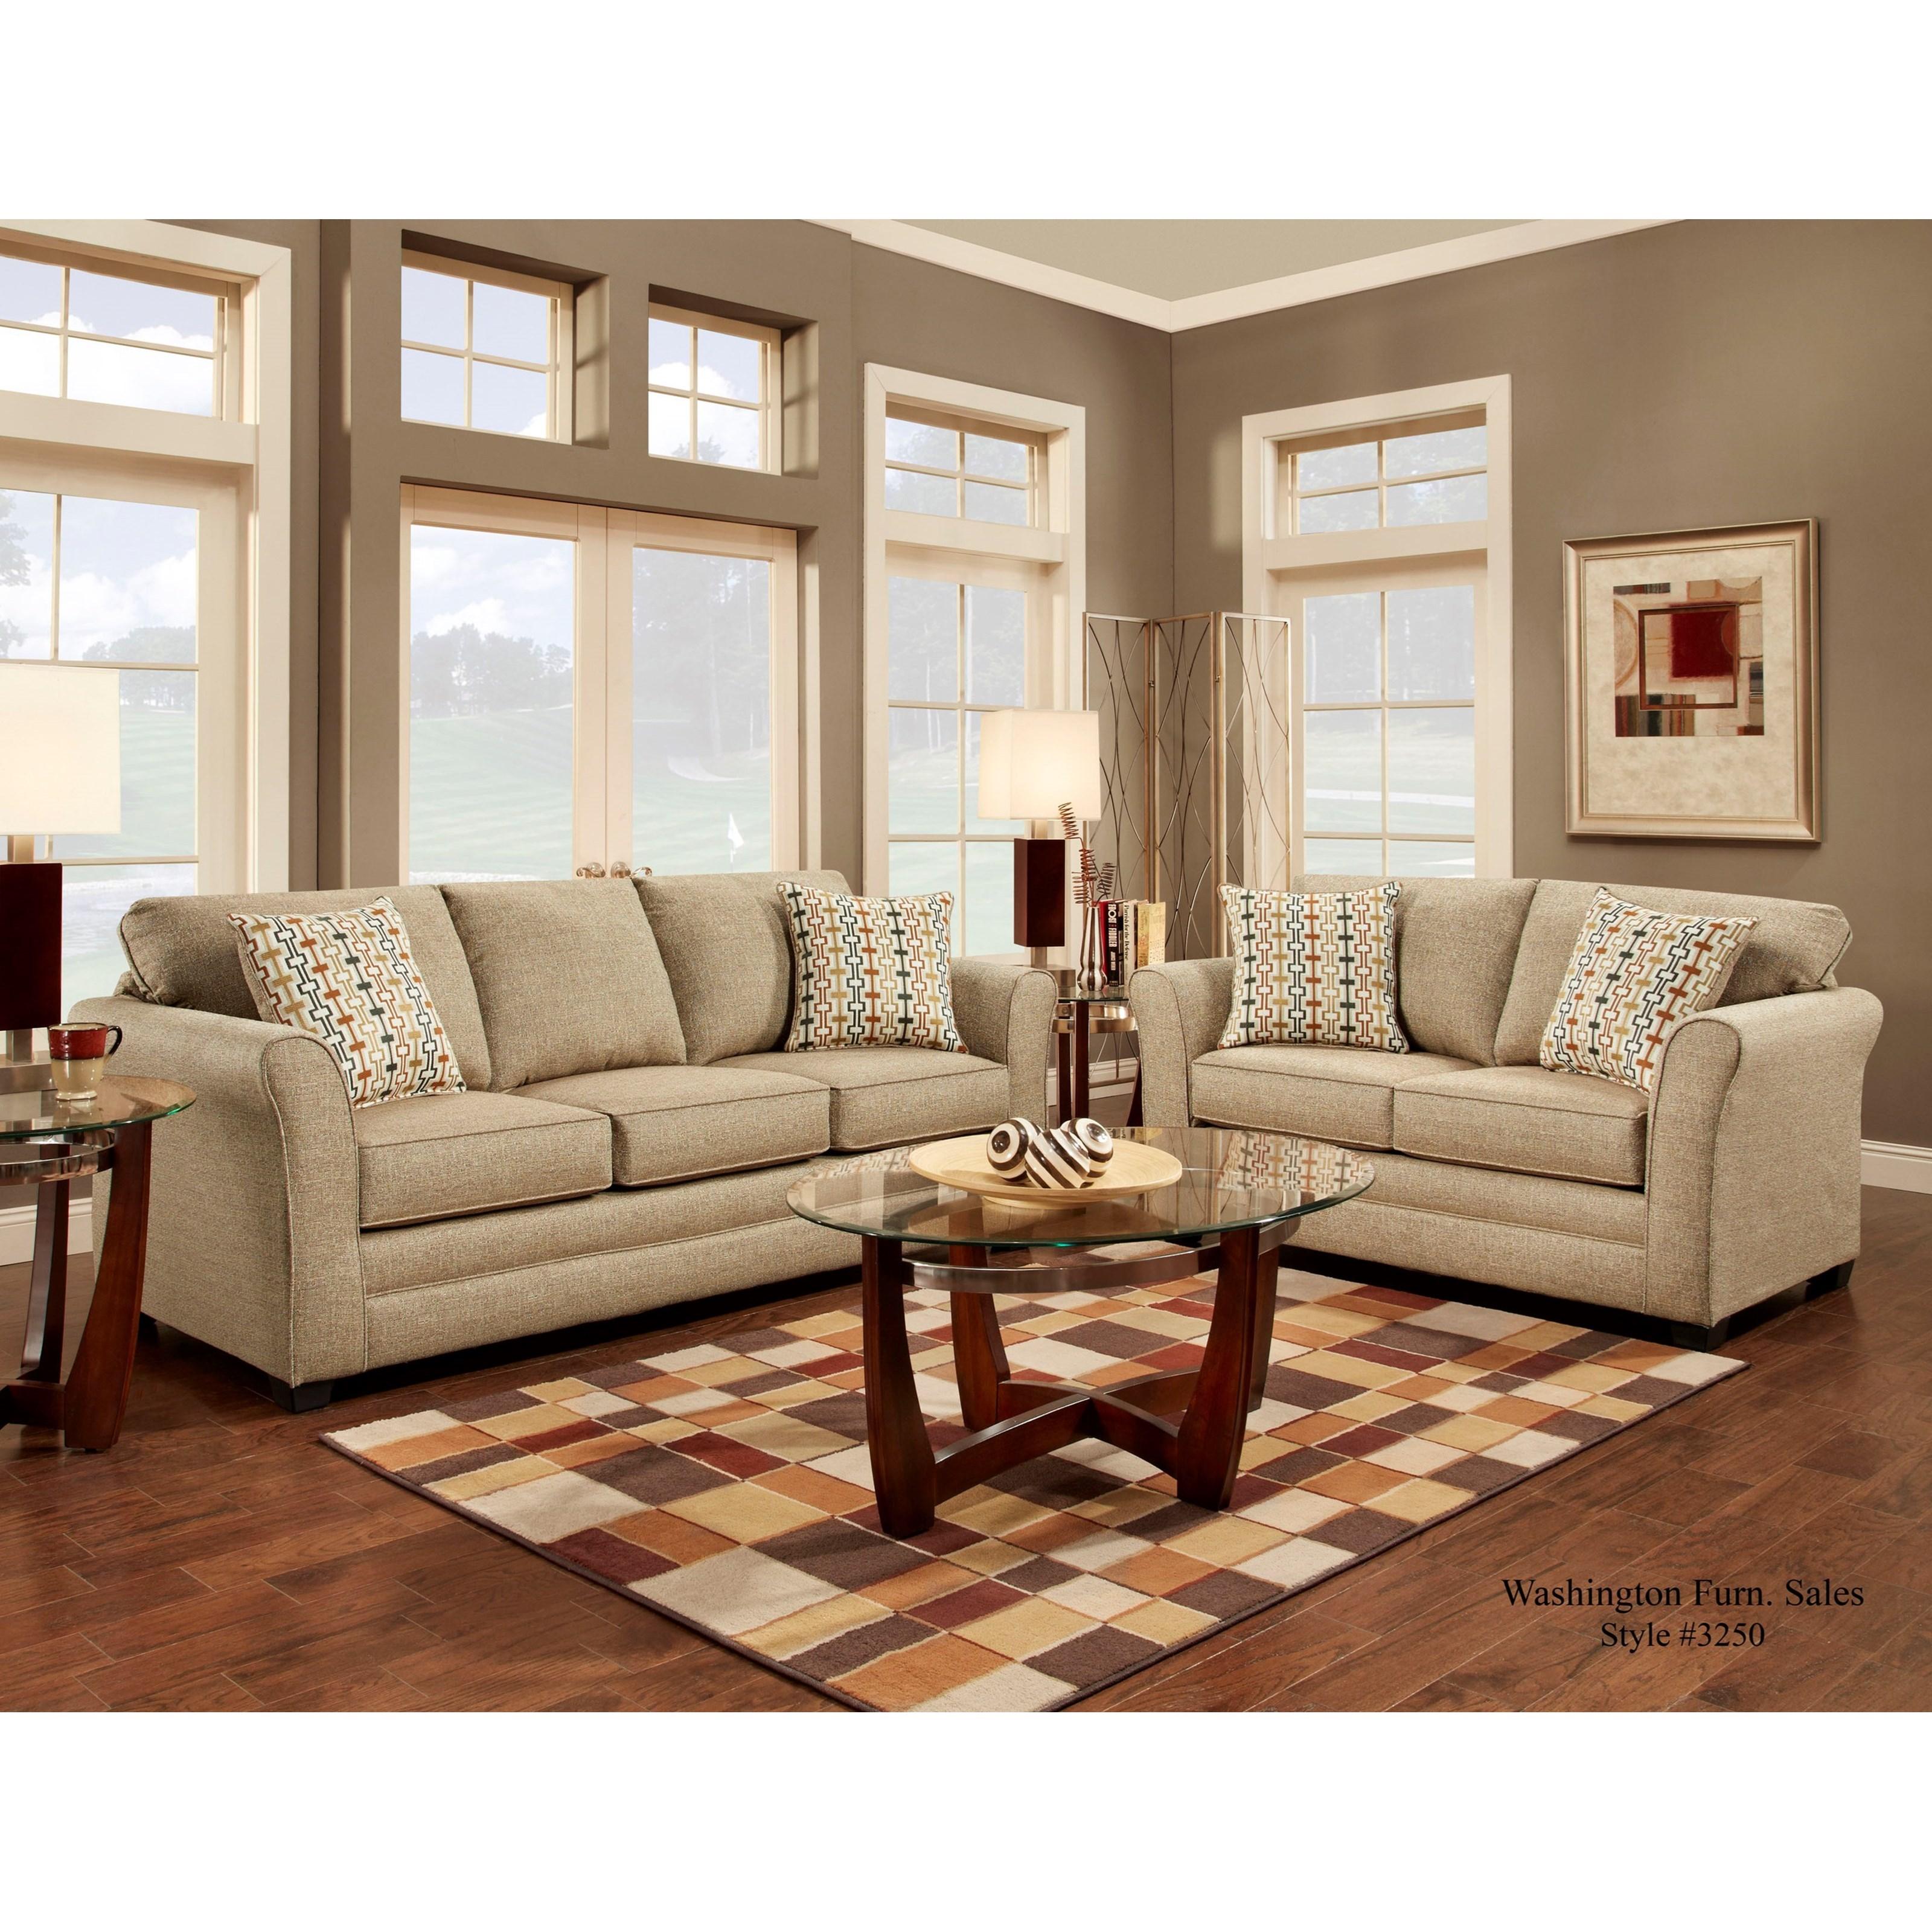 Washington Furniture 3250 Washington Living Room Group